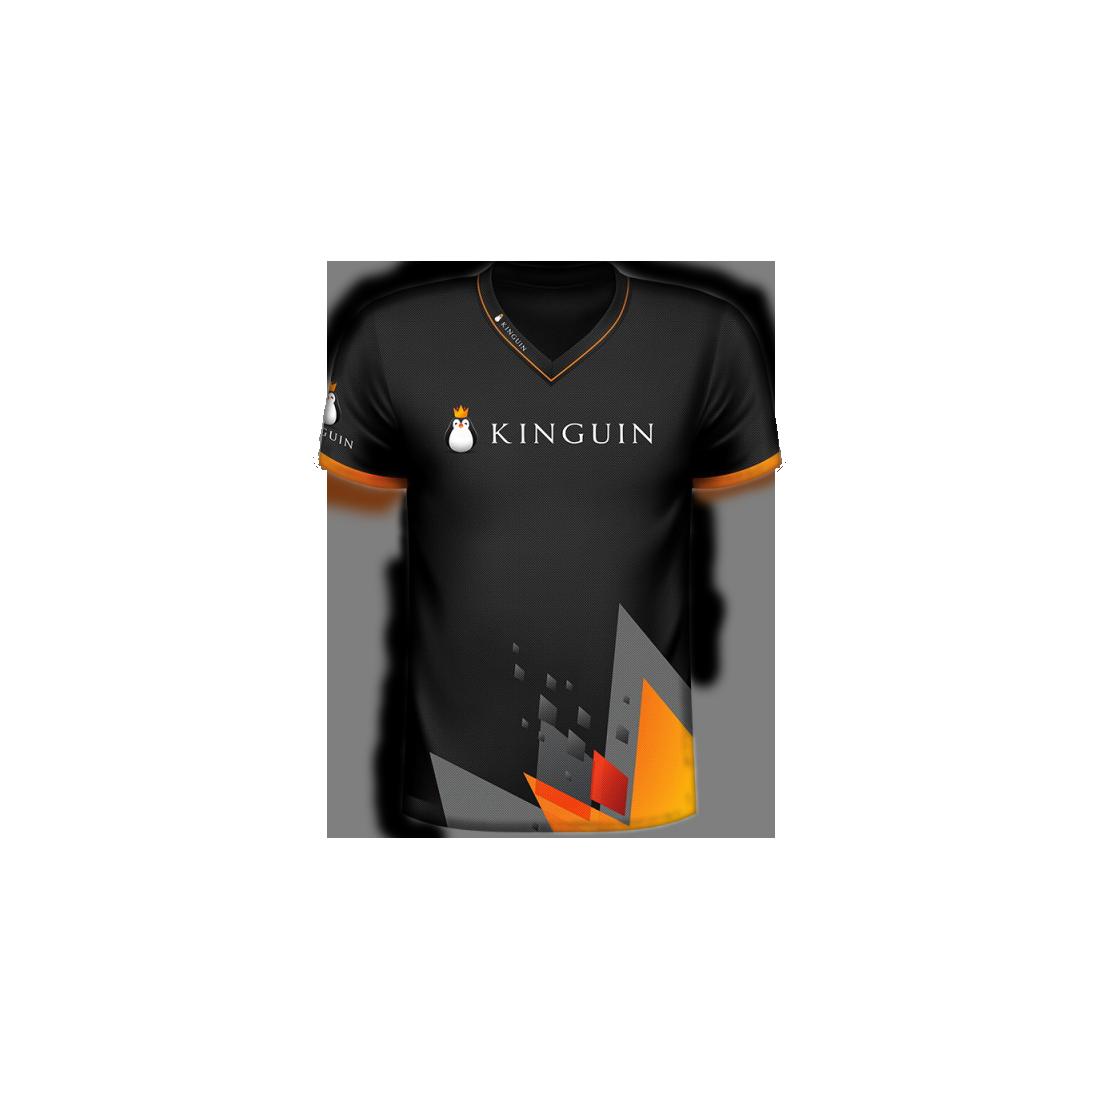 Koszulka Kinguin - rozmiar M